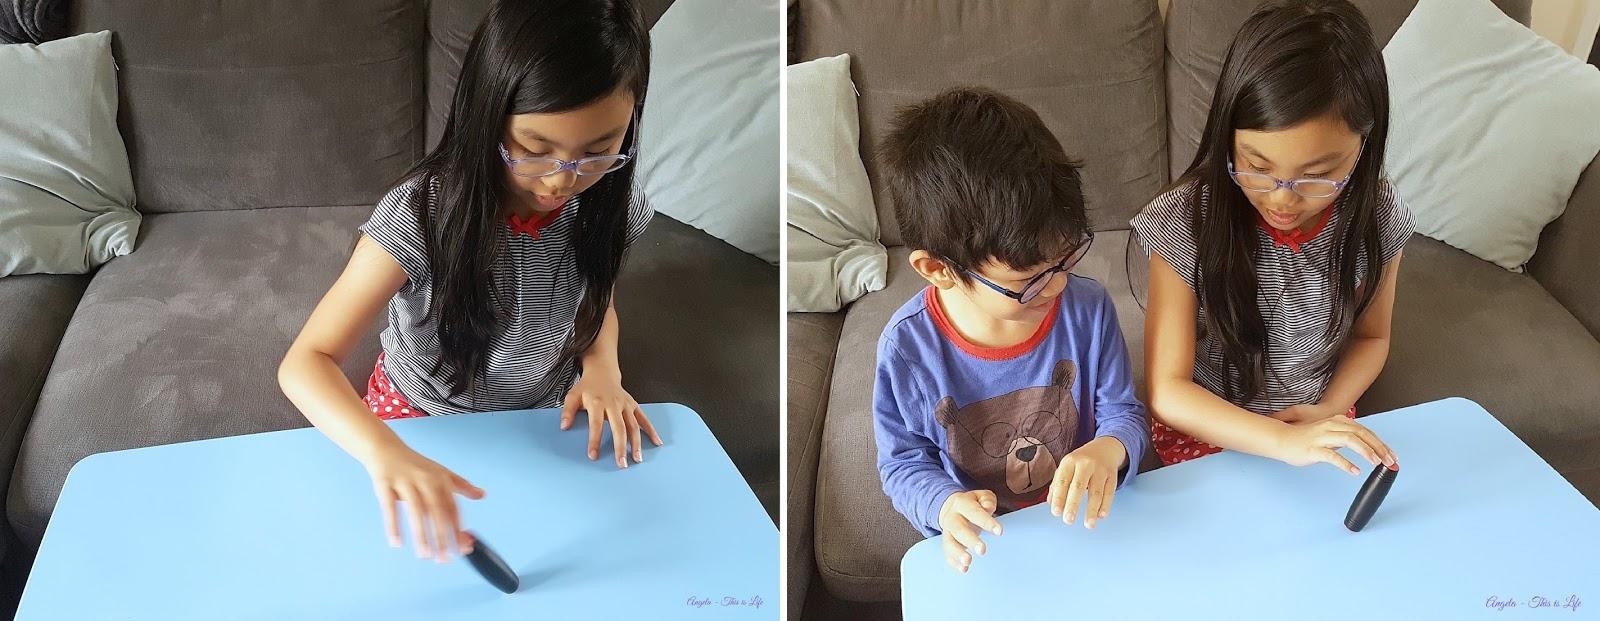 fidget toy, Mokuru stick desk toy, toy for all ages